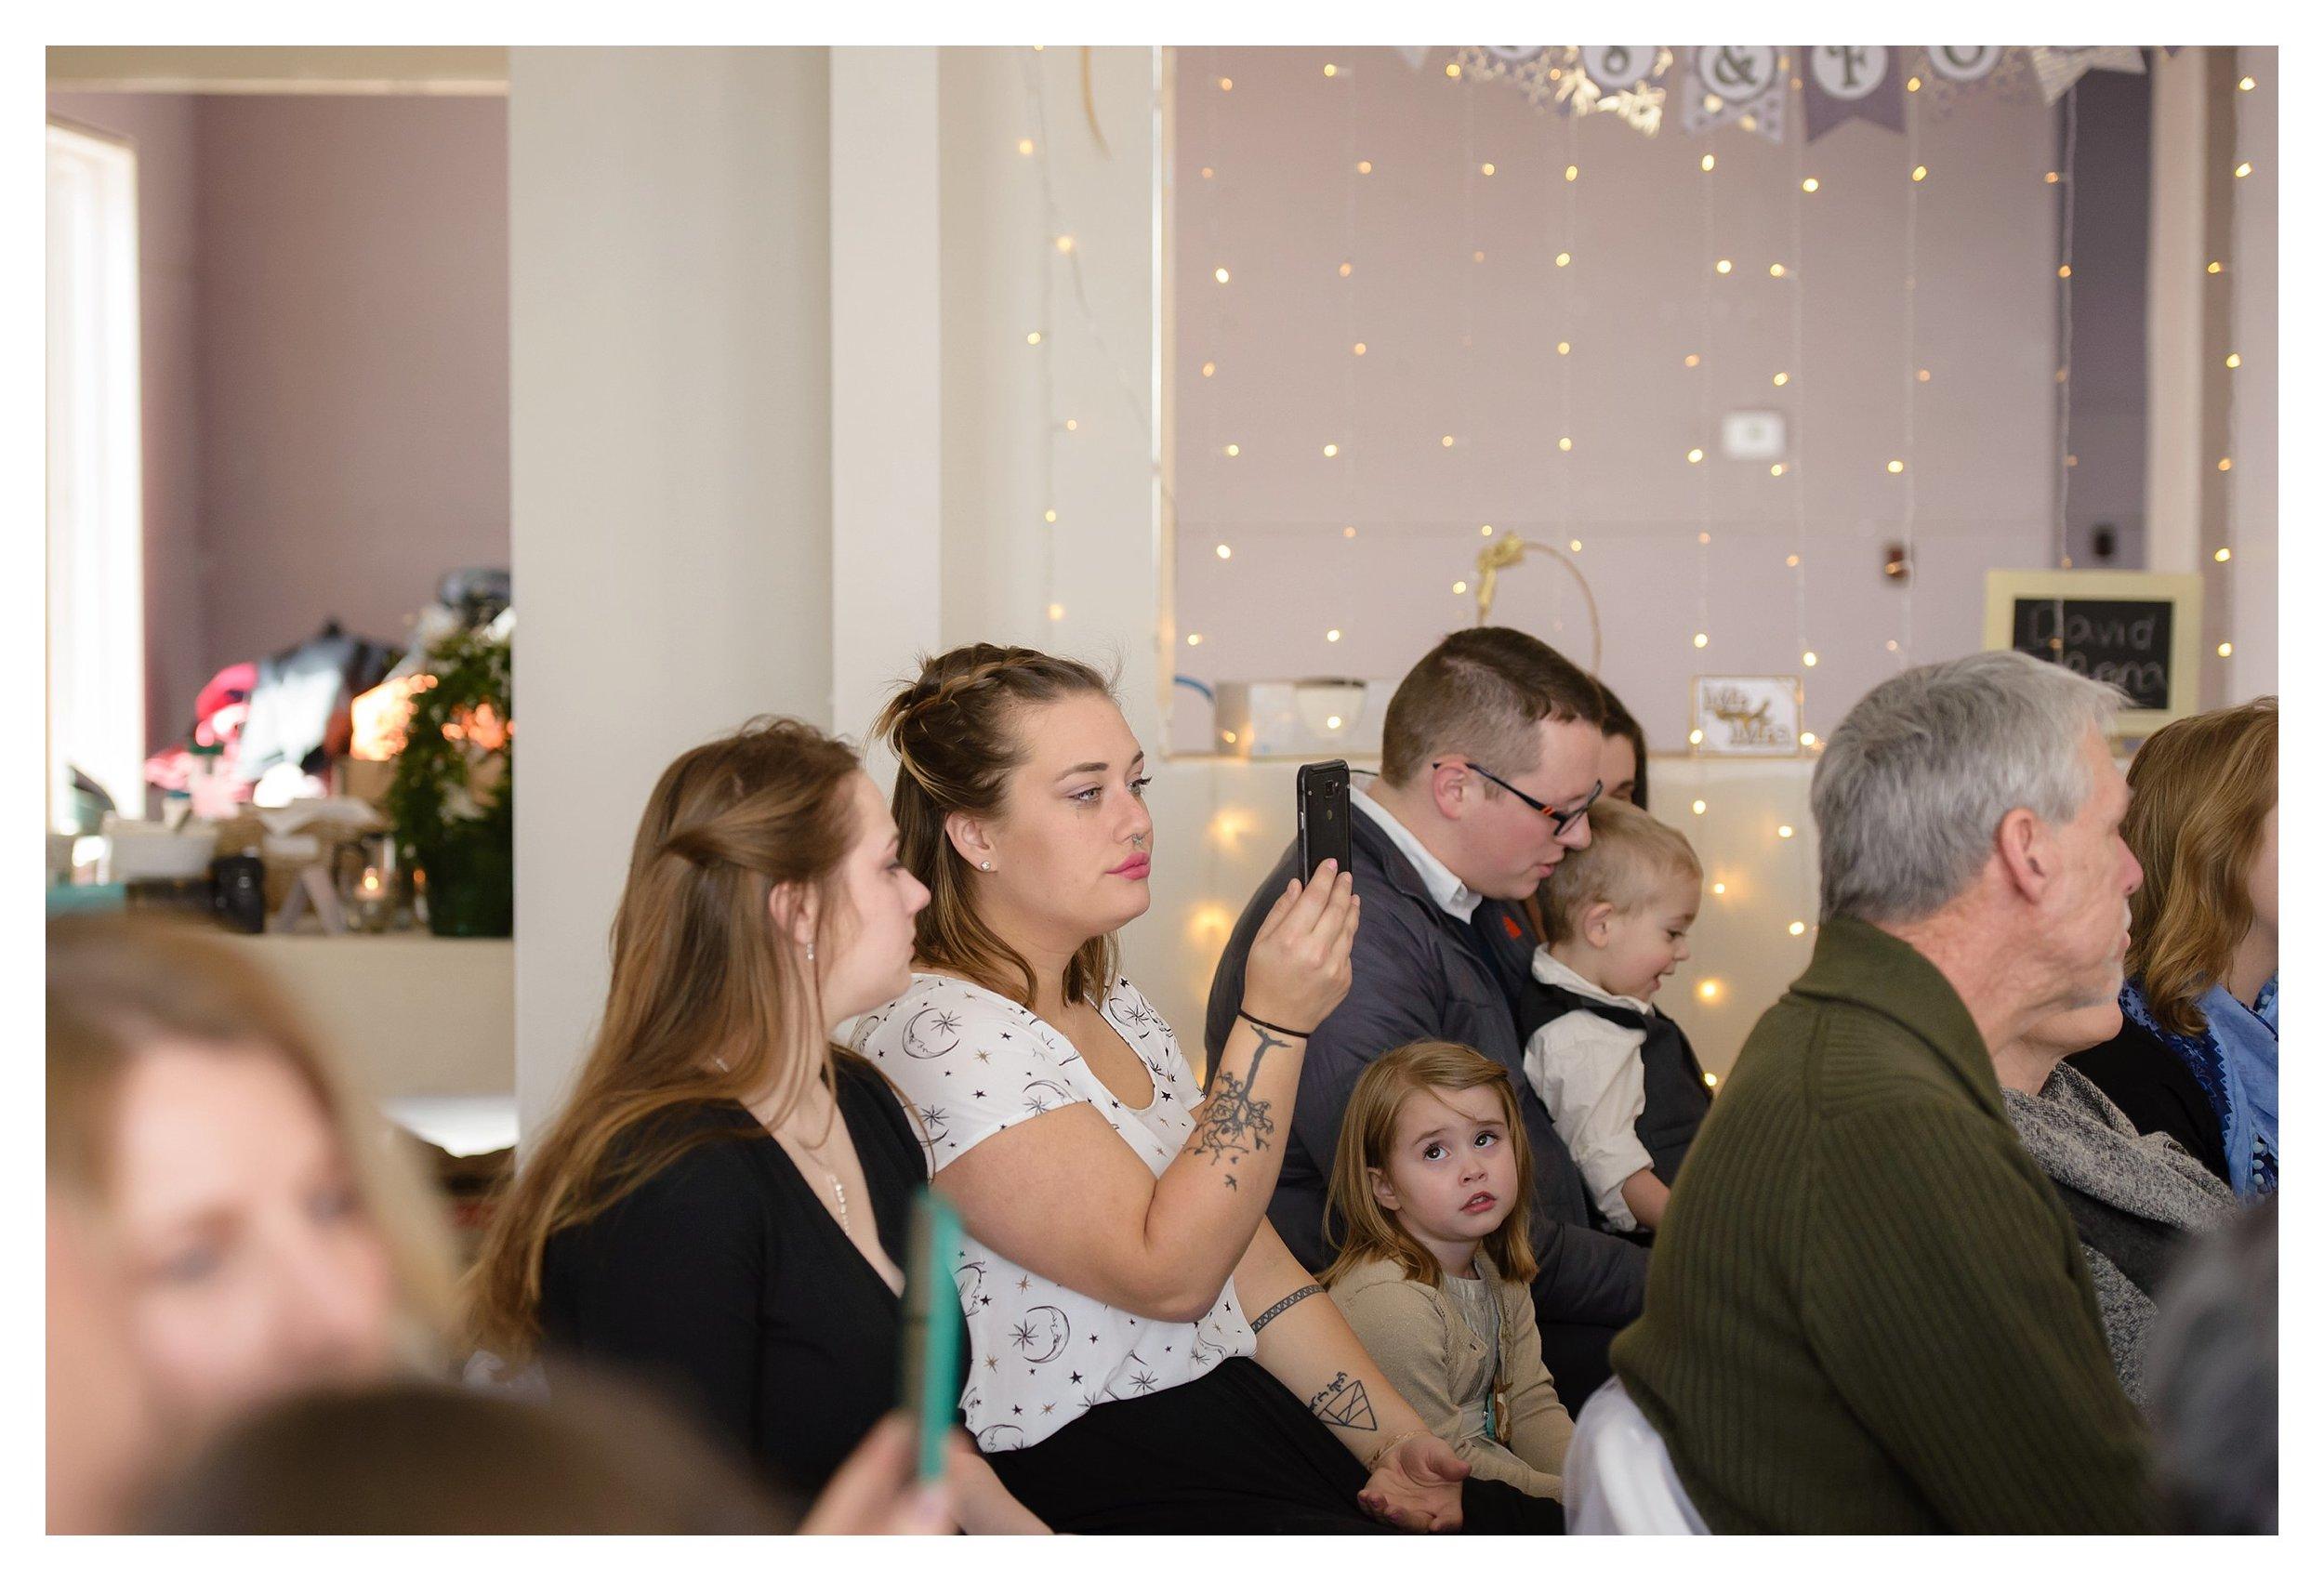 wisconsin wedding photographer timber baron inn bayfield wi ps 139 photography jen jensen_0205.jpg